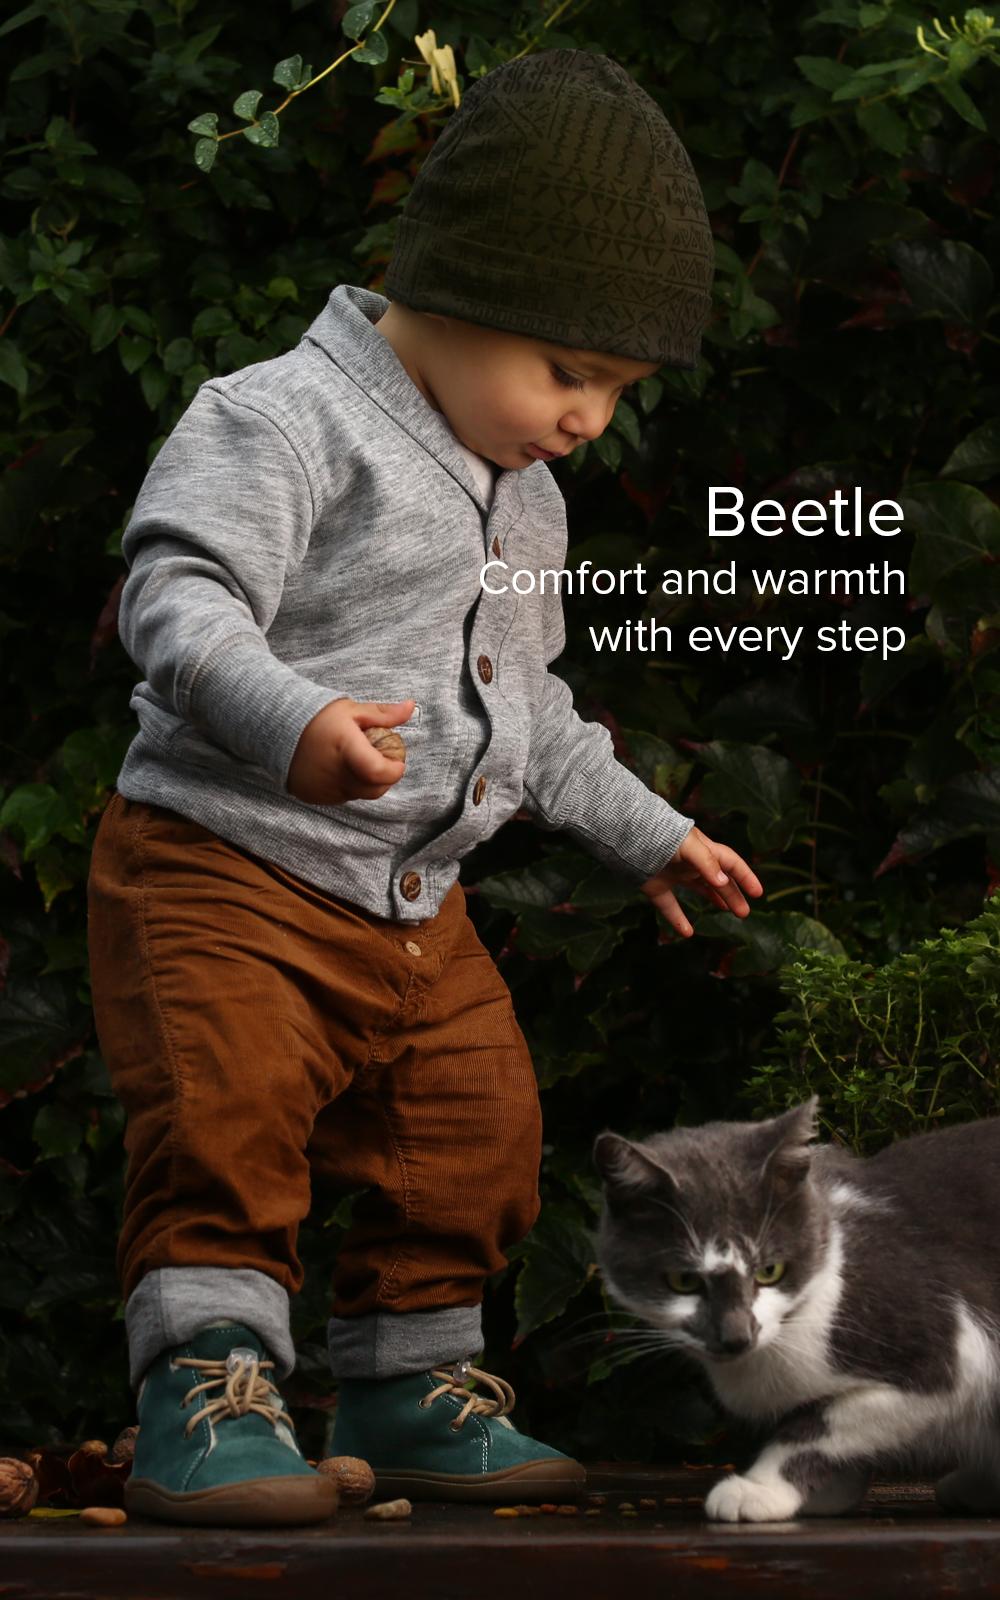 beetle lana